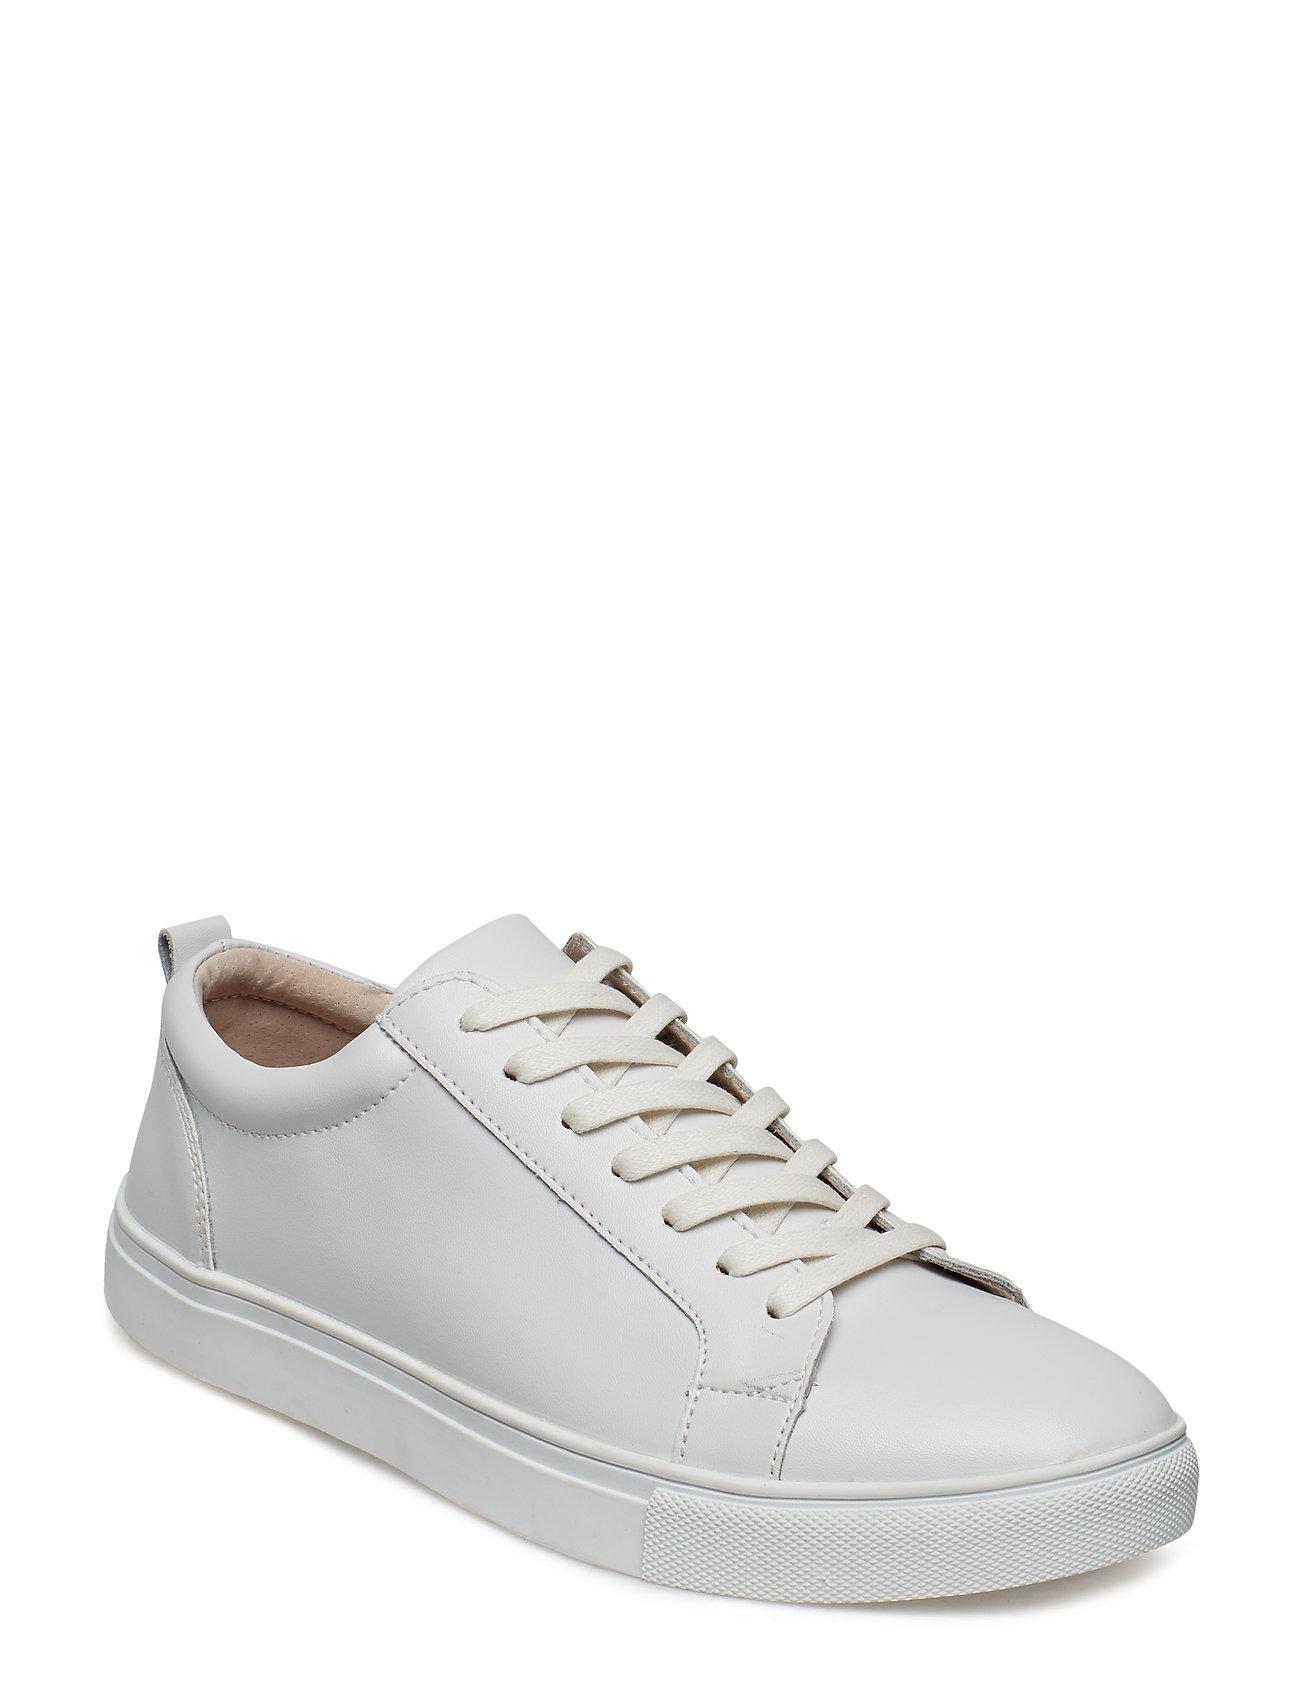 eae6f0b0f01 Cole Ii L sneakers fra Shoe The Bear til herre i Sort - Pashion.dk